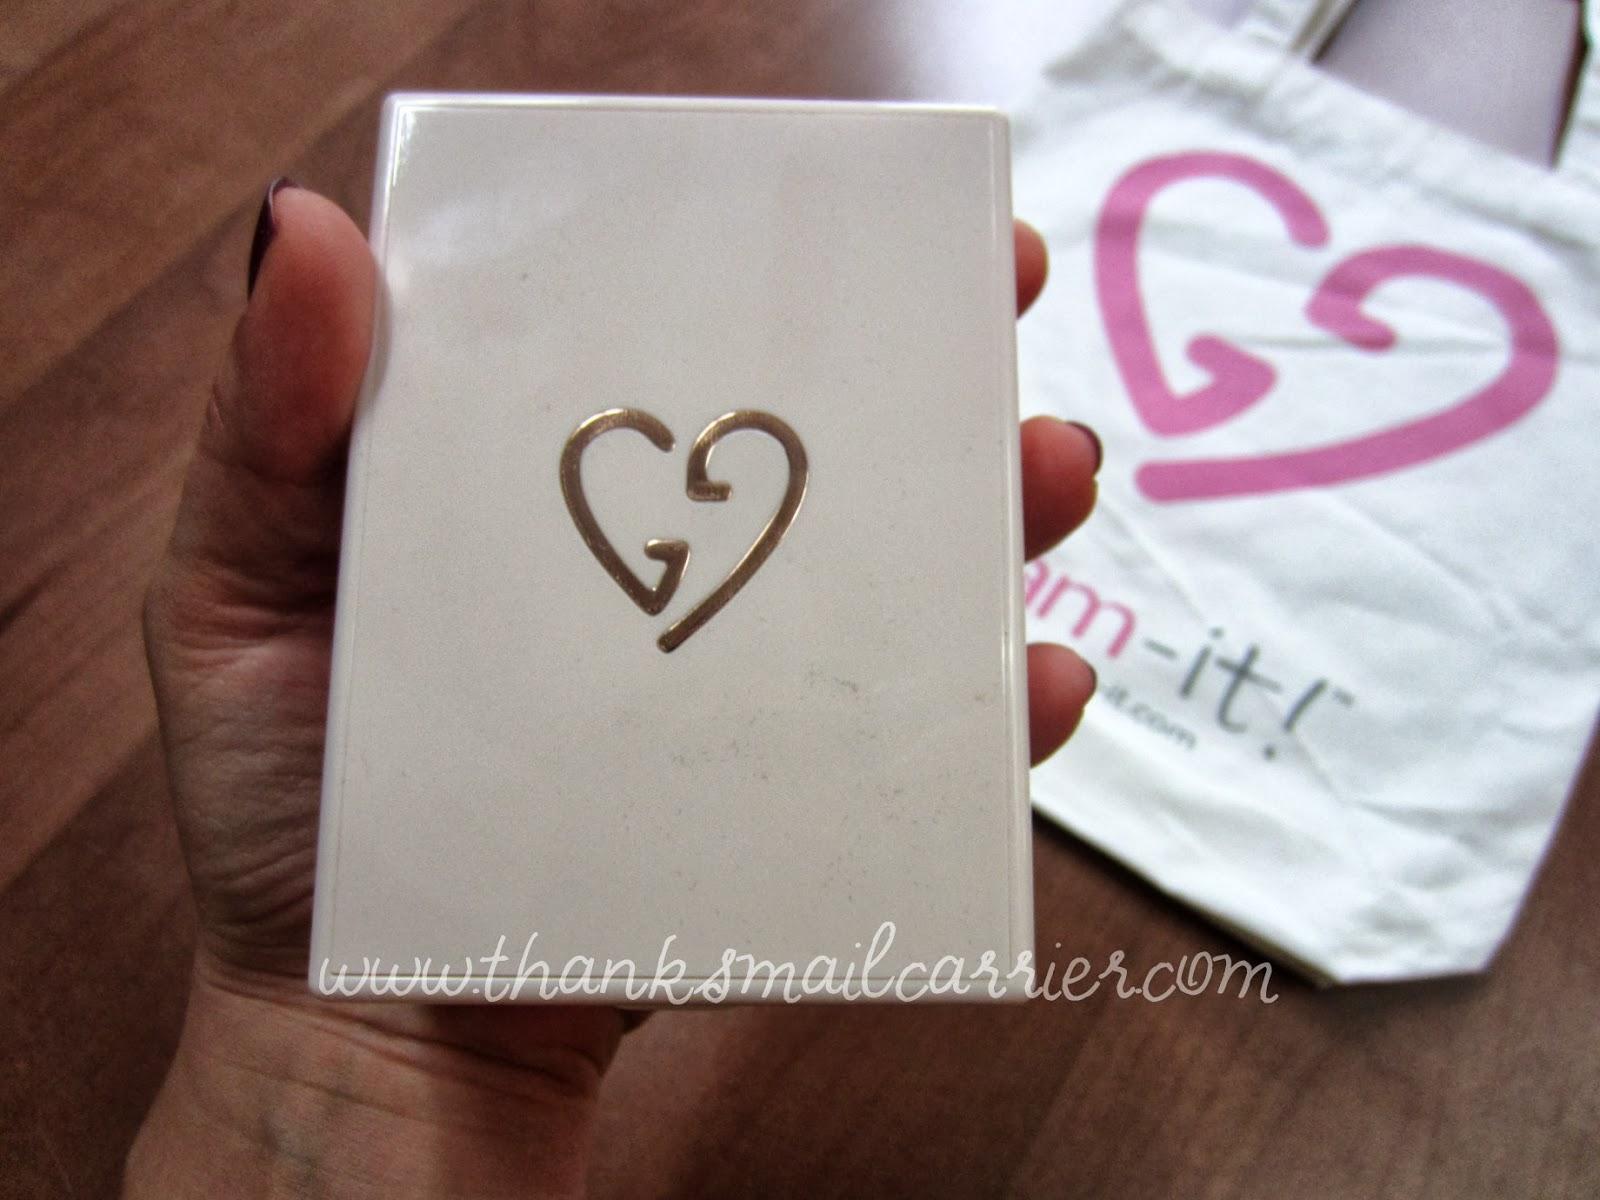 GlamPact makeup compact